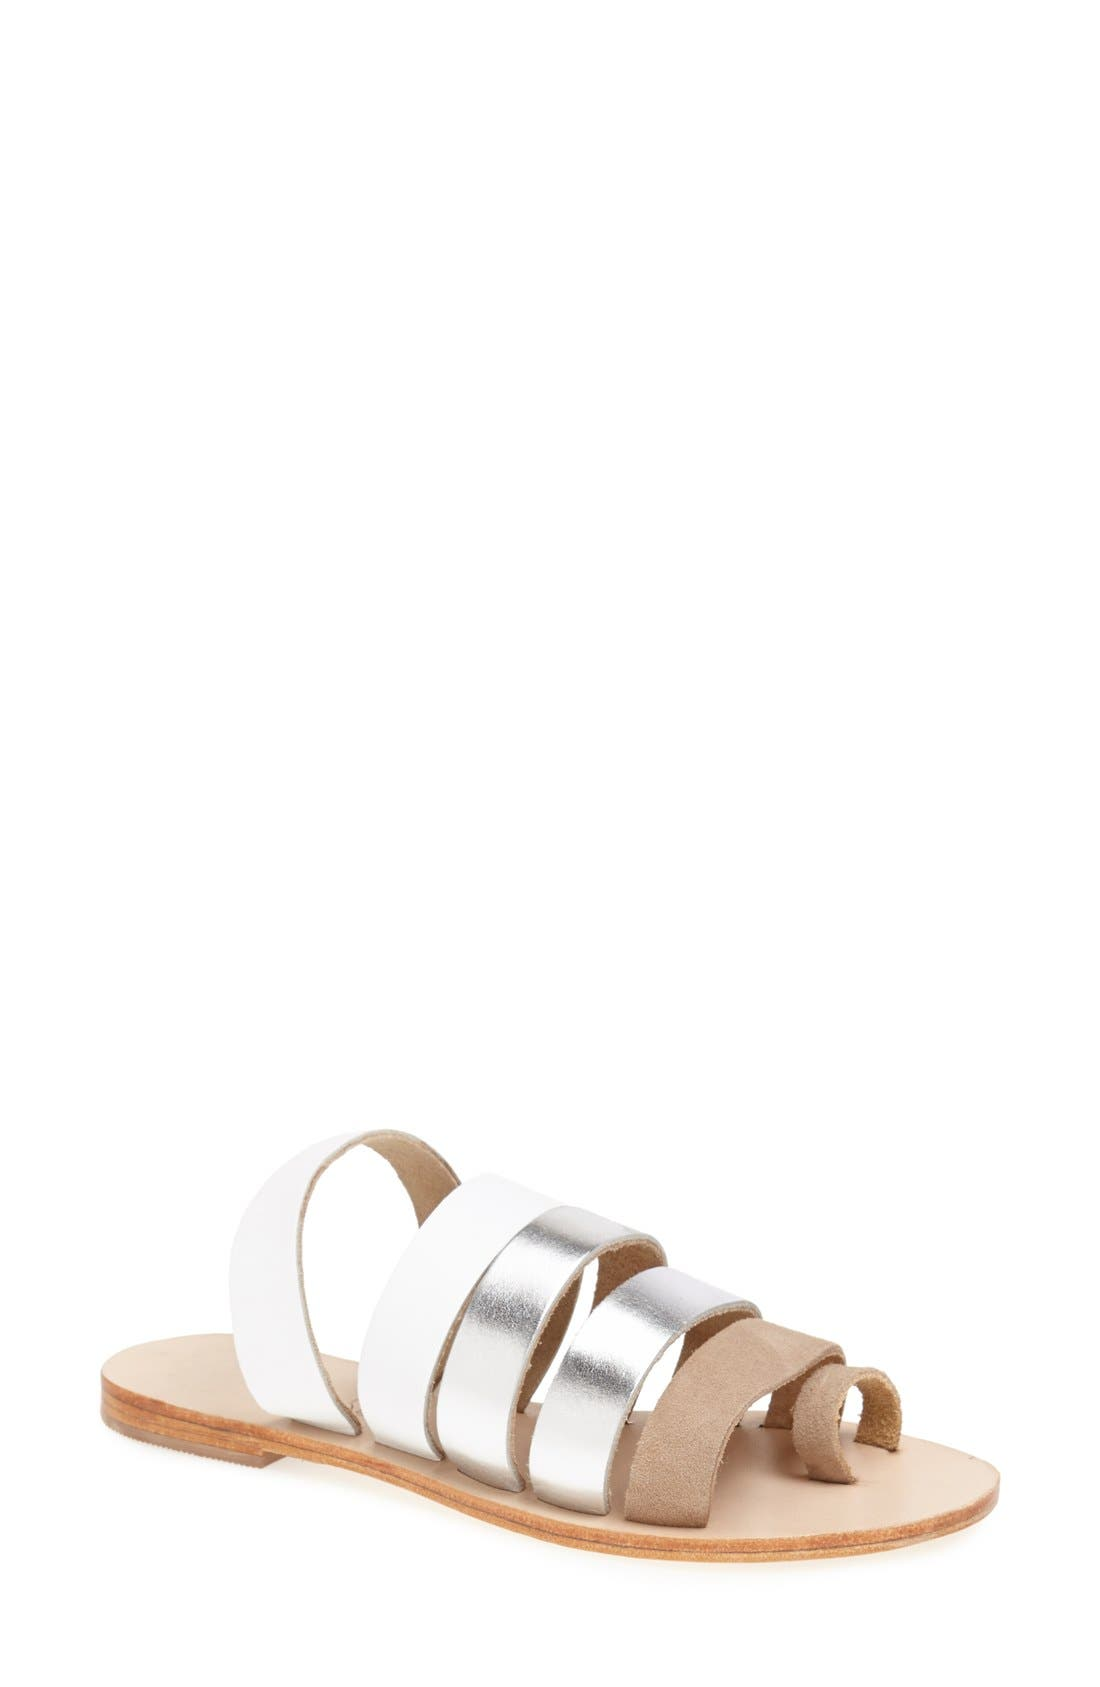 Main Image - Sol Sana 'Ayden' Sandal (Women)